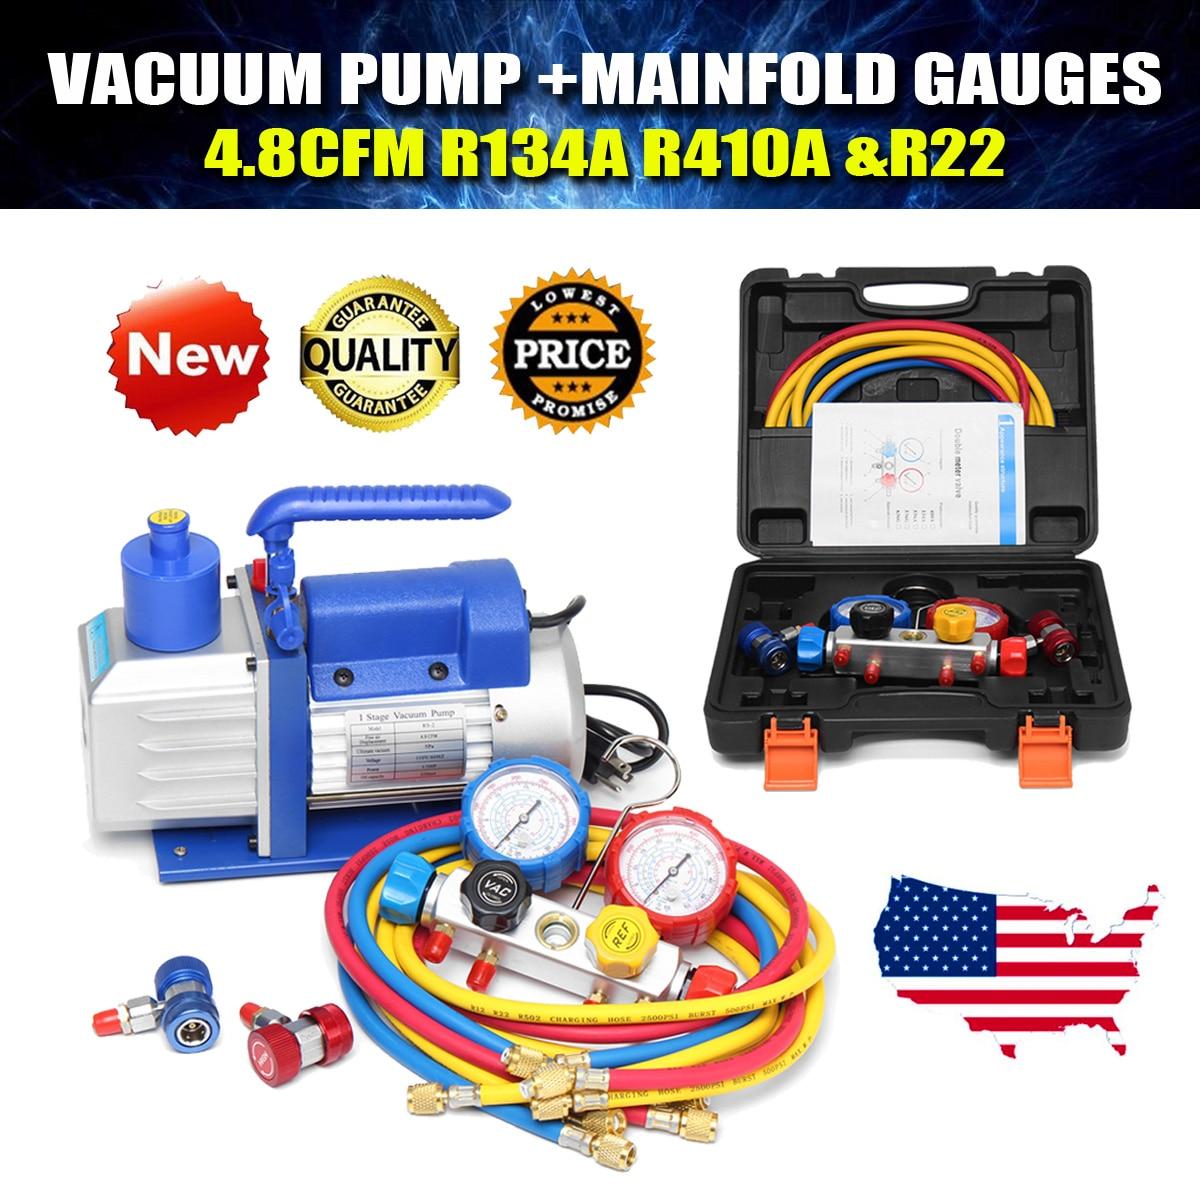 R134A R22 R410A 4.8CFM Vacuum Pump HVA/C Refrigerant W/4VALVE MANIFOLD GAUGE Pumps Parts And Accessories цена и фото